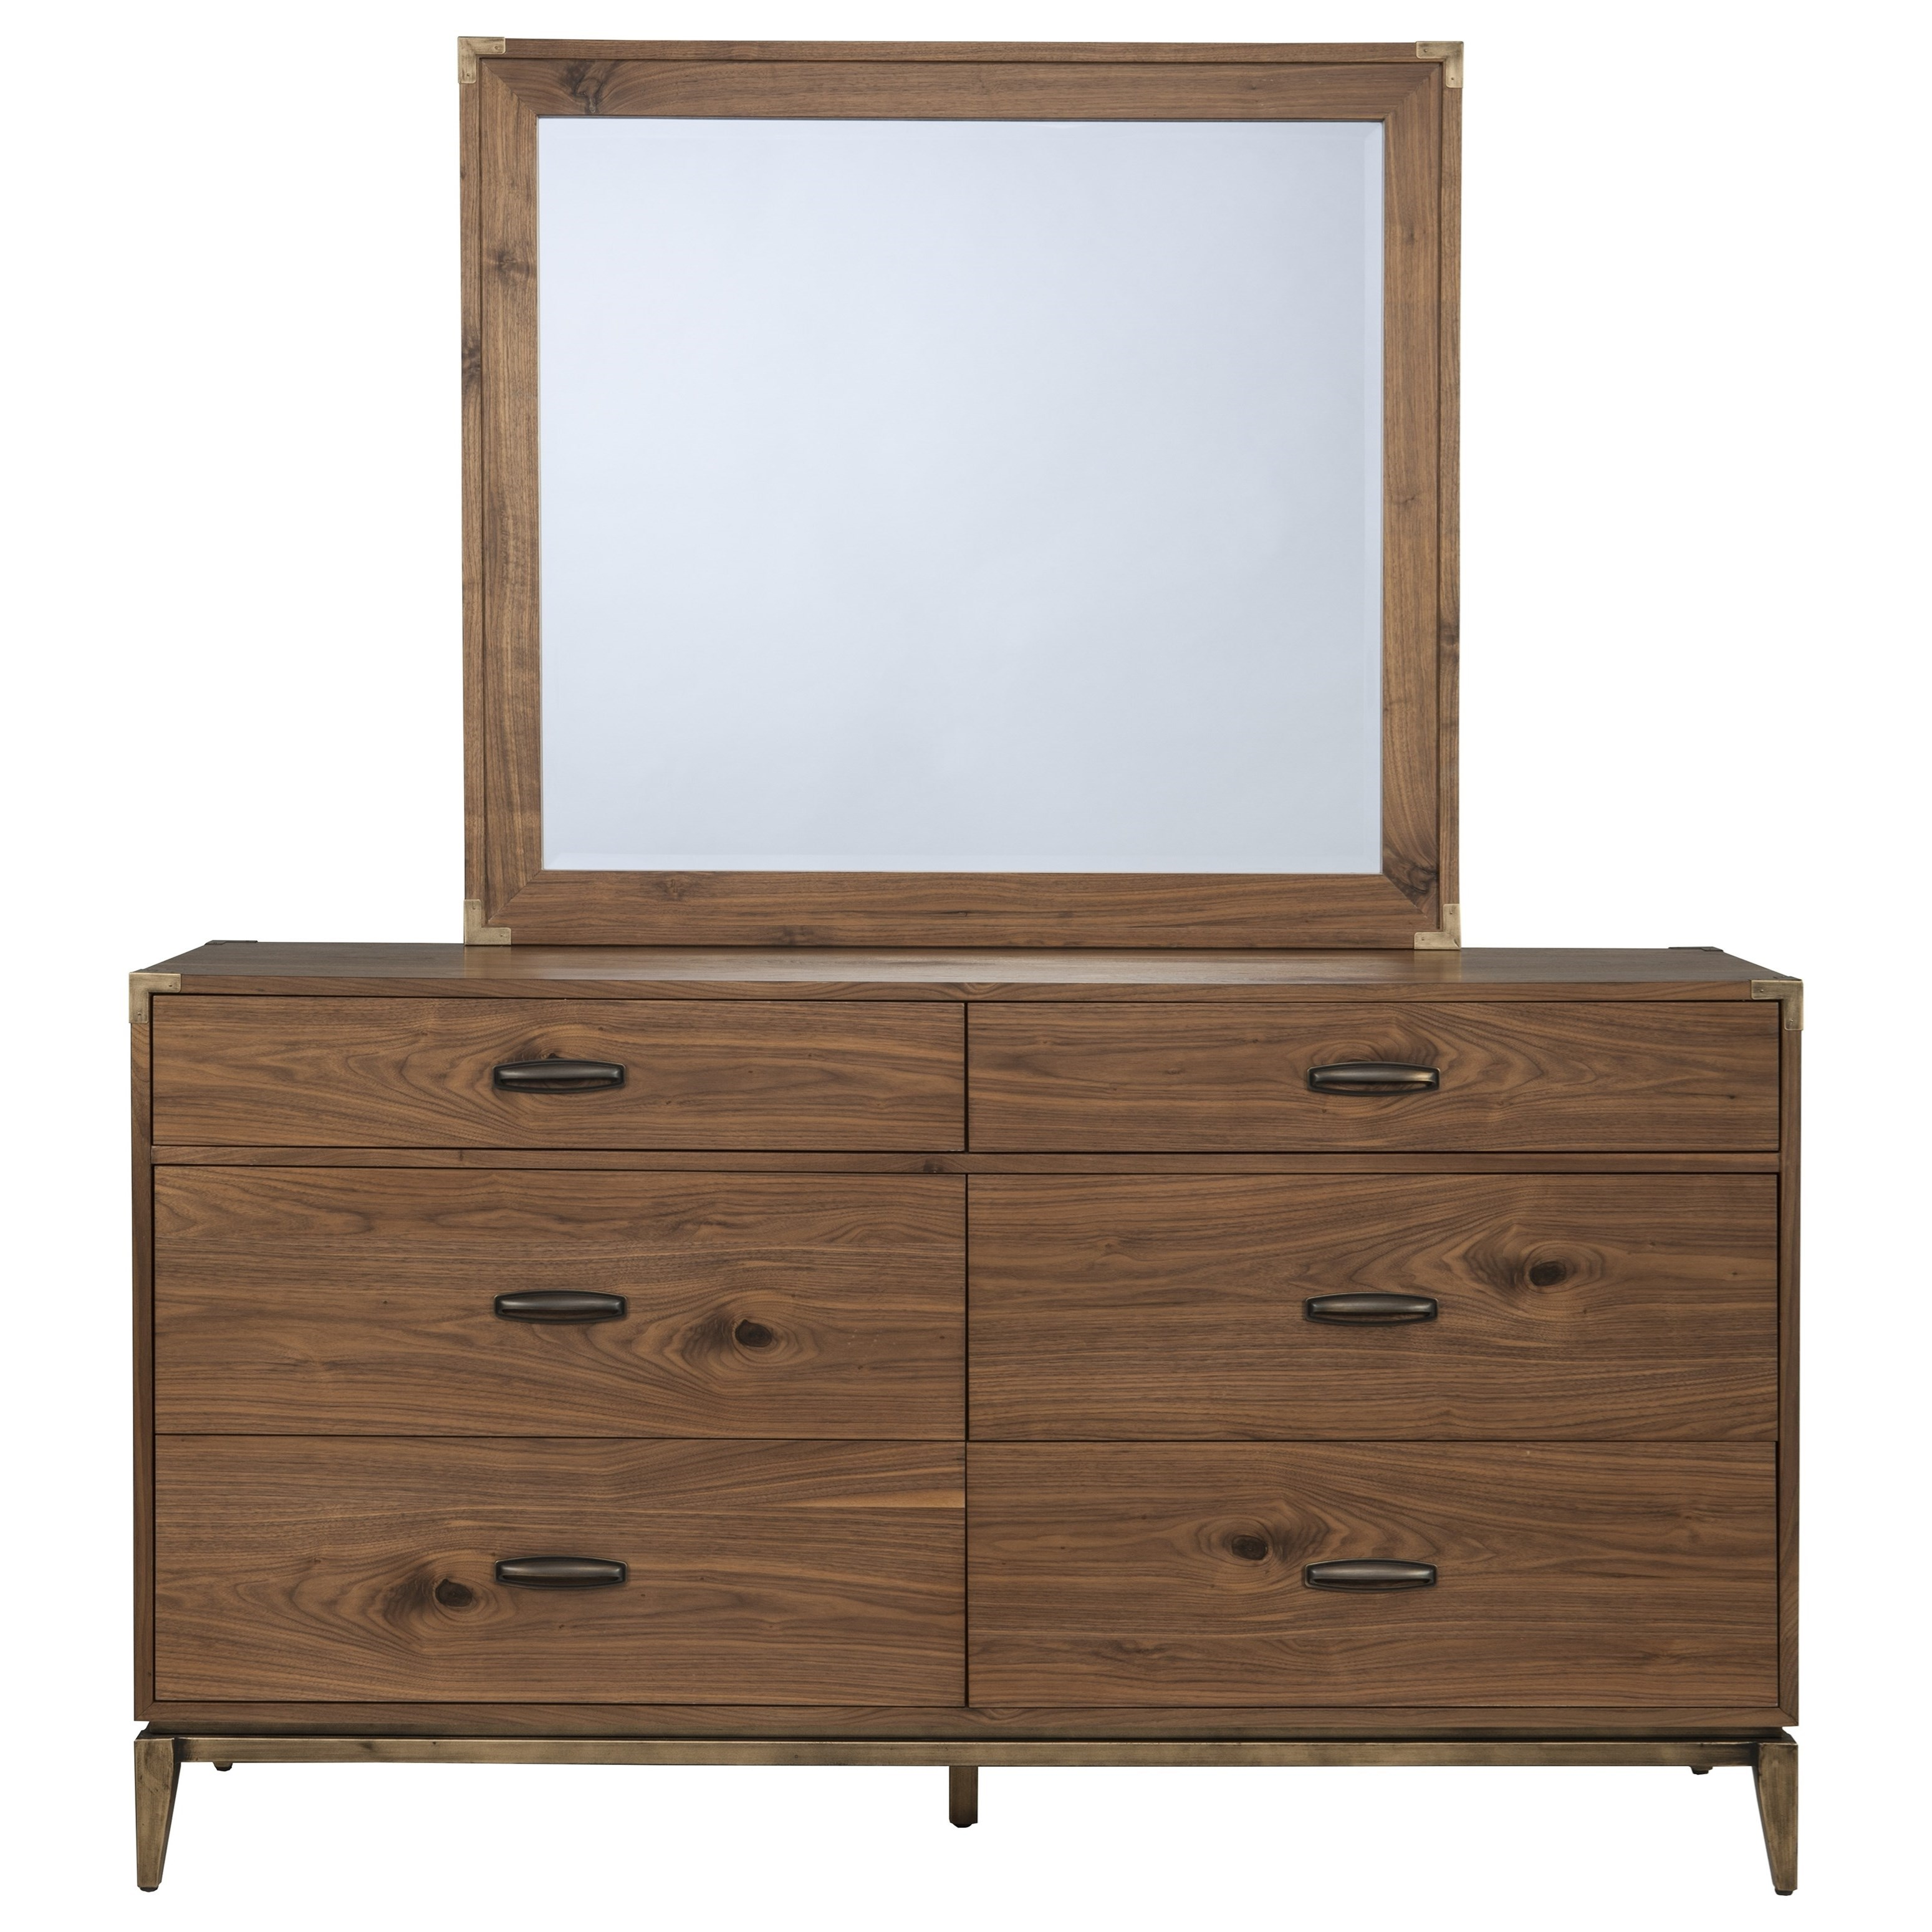 Adler Six Drawer Dresser and Mirror by Modus International at A1 Furniture & Mattress